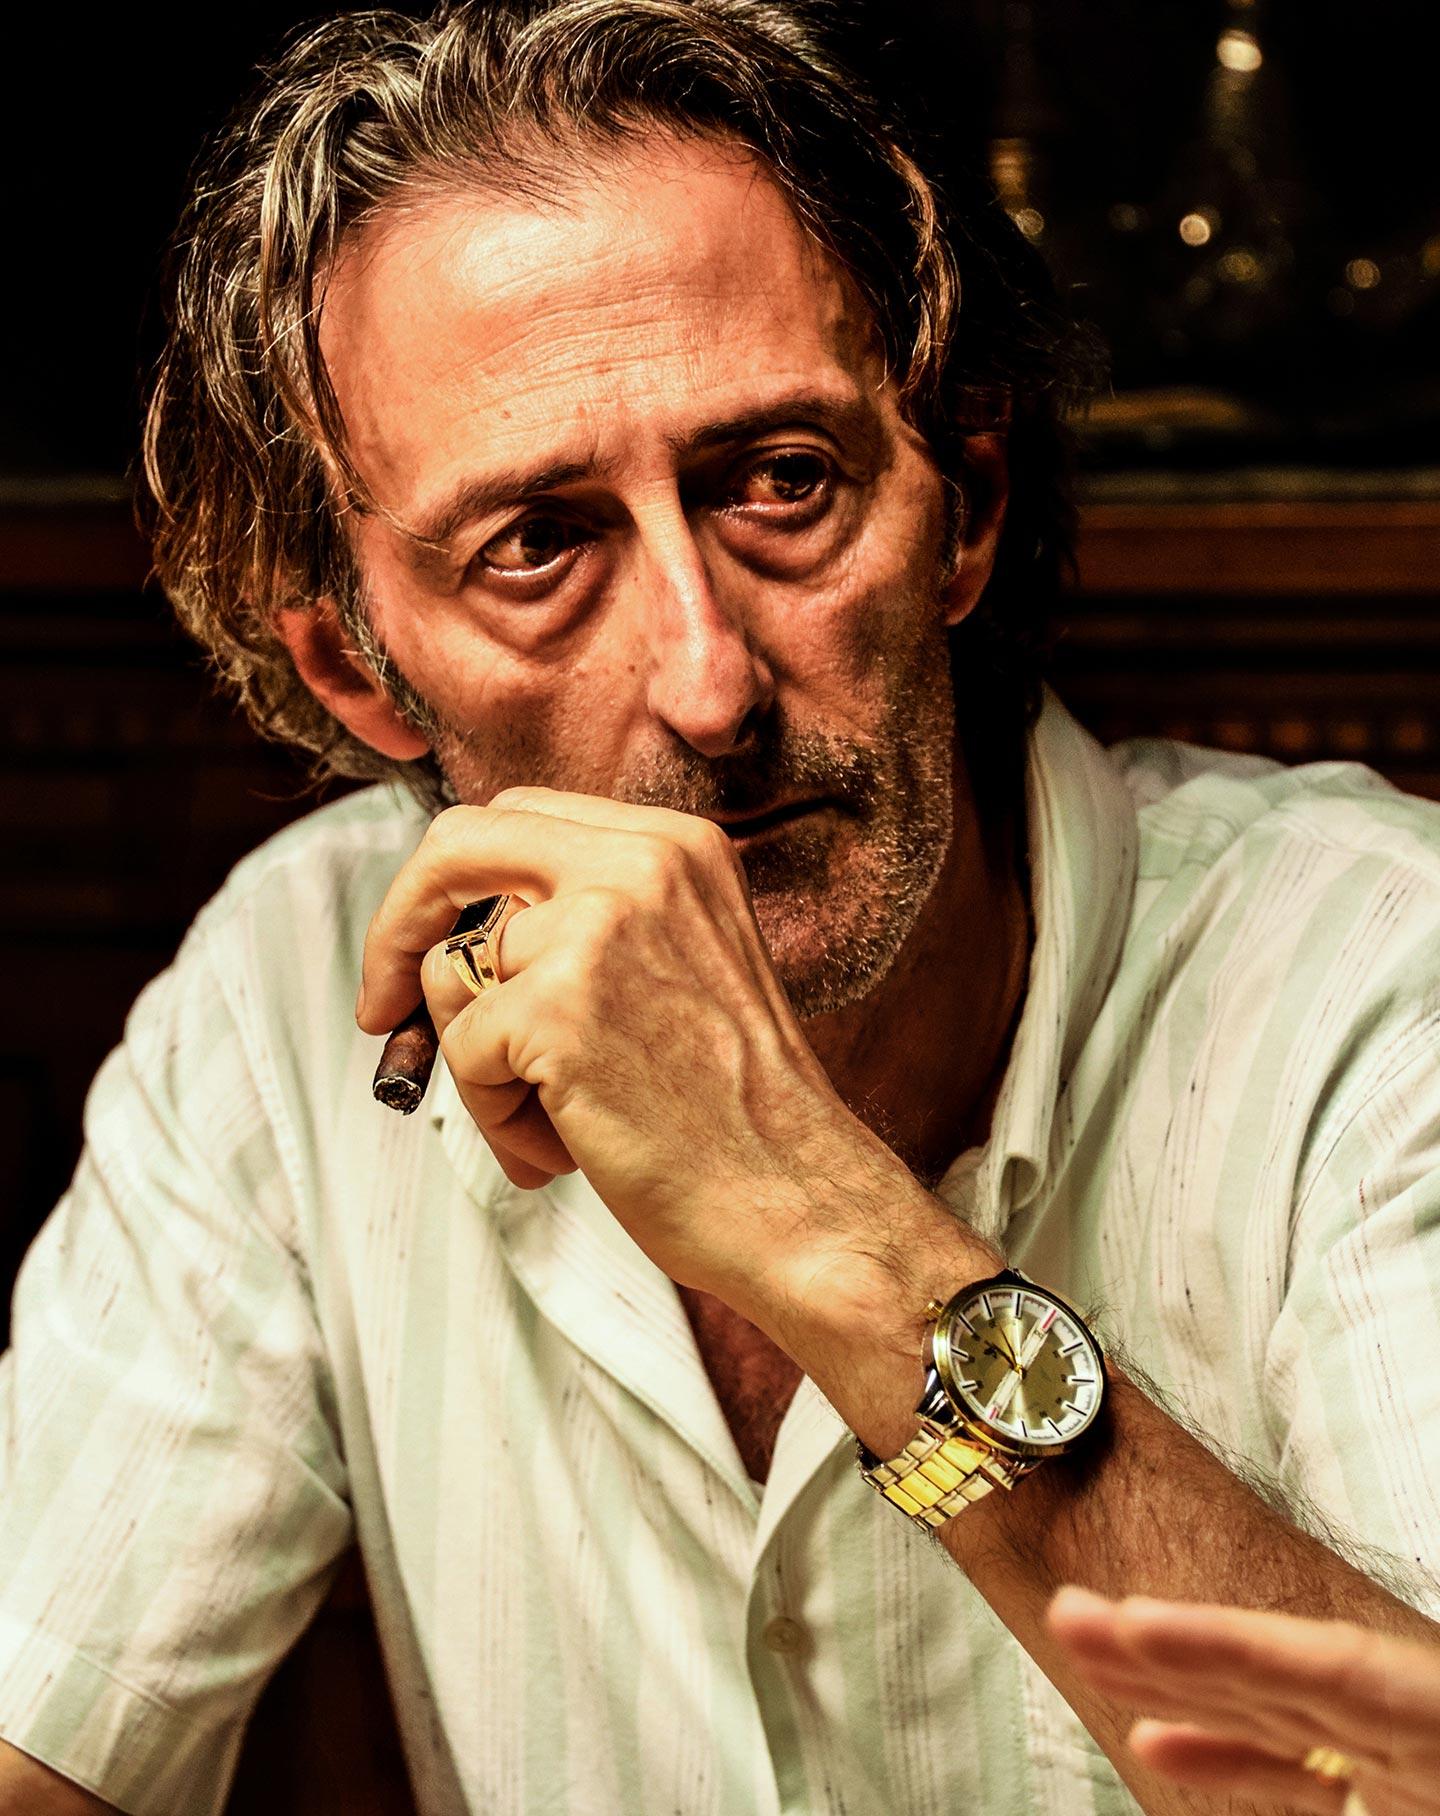 Nando Paone interpreta Donato Vasile